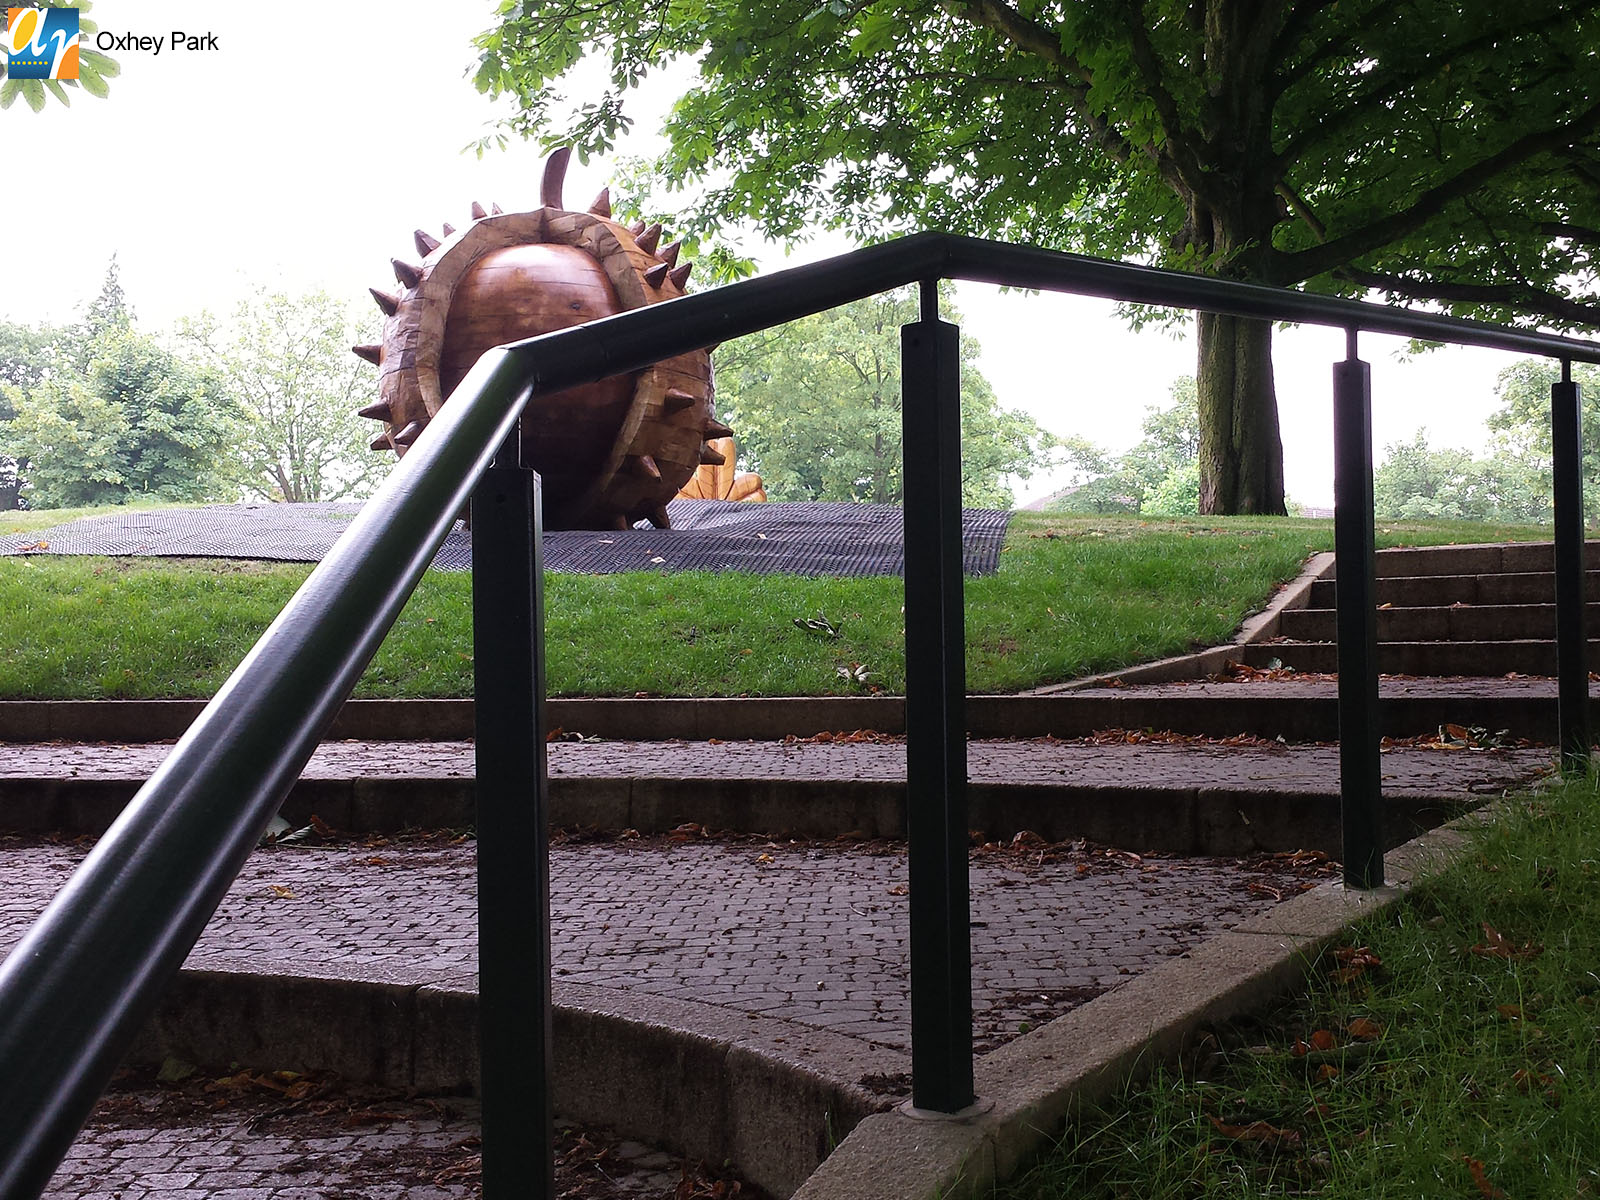 Oxhey Park metal handrail